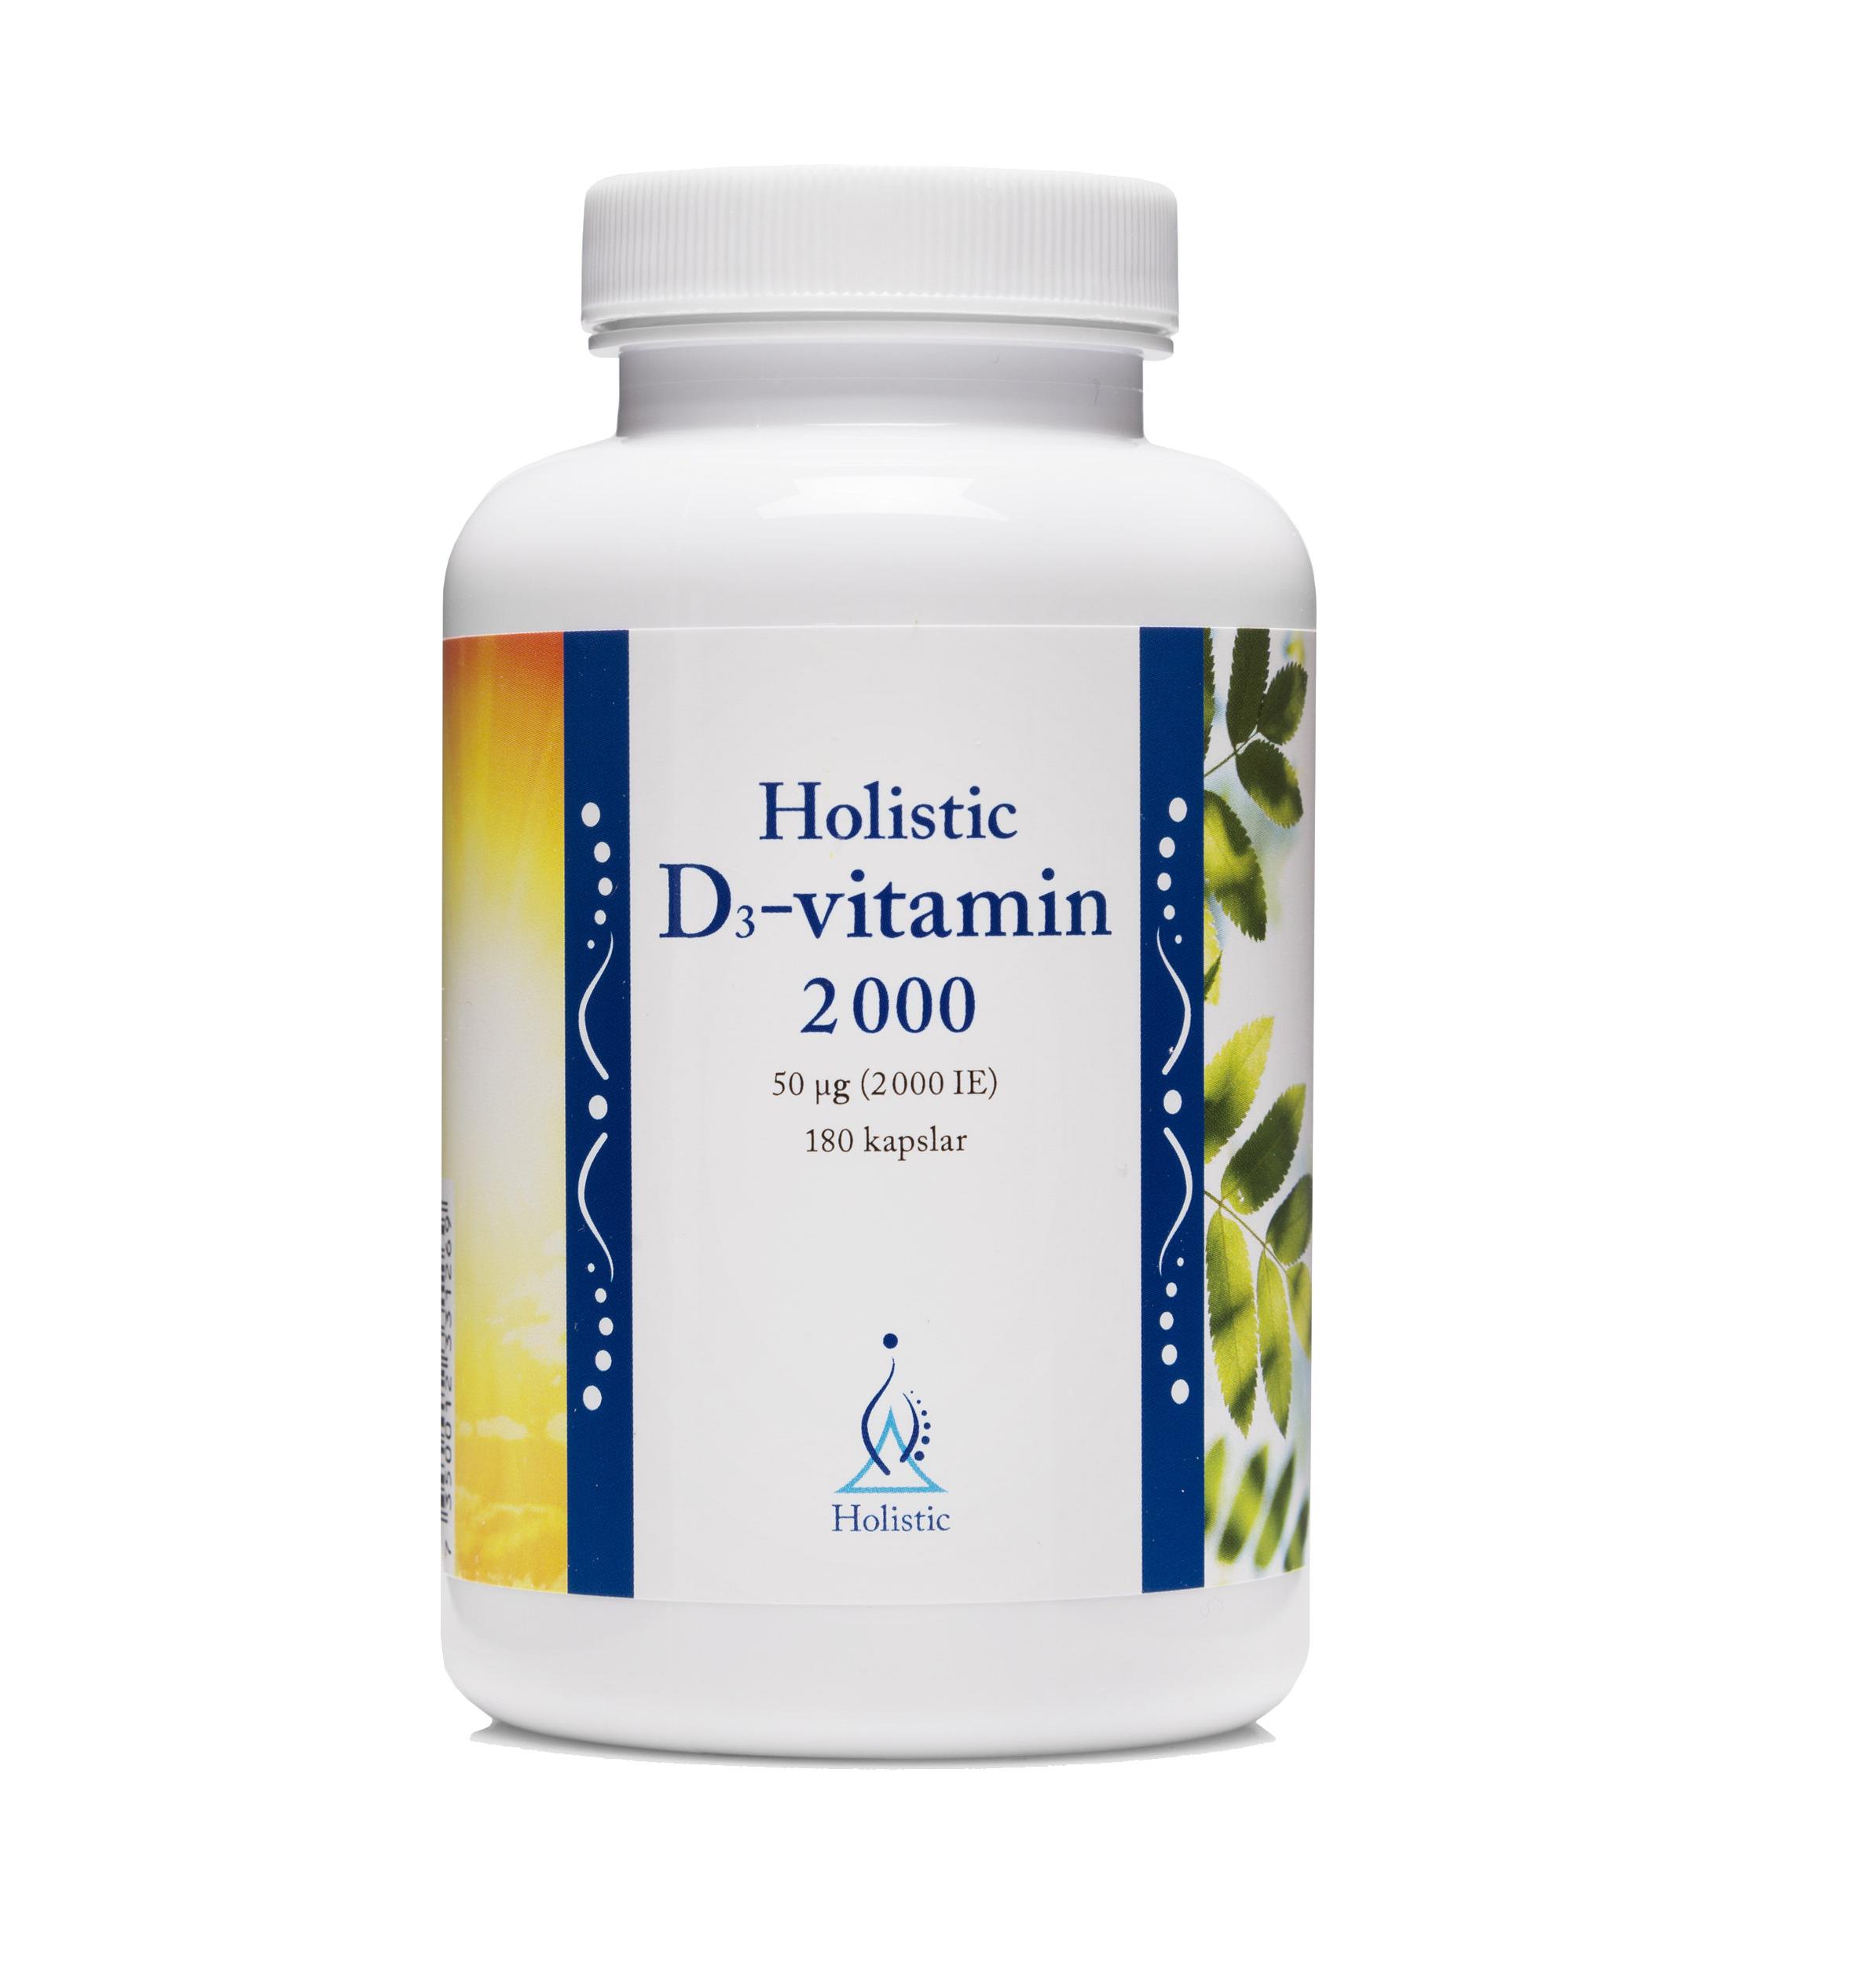 D3-vitamin 2000